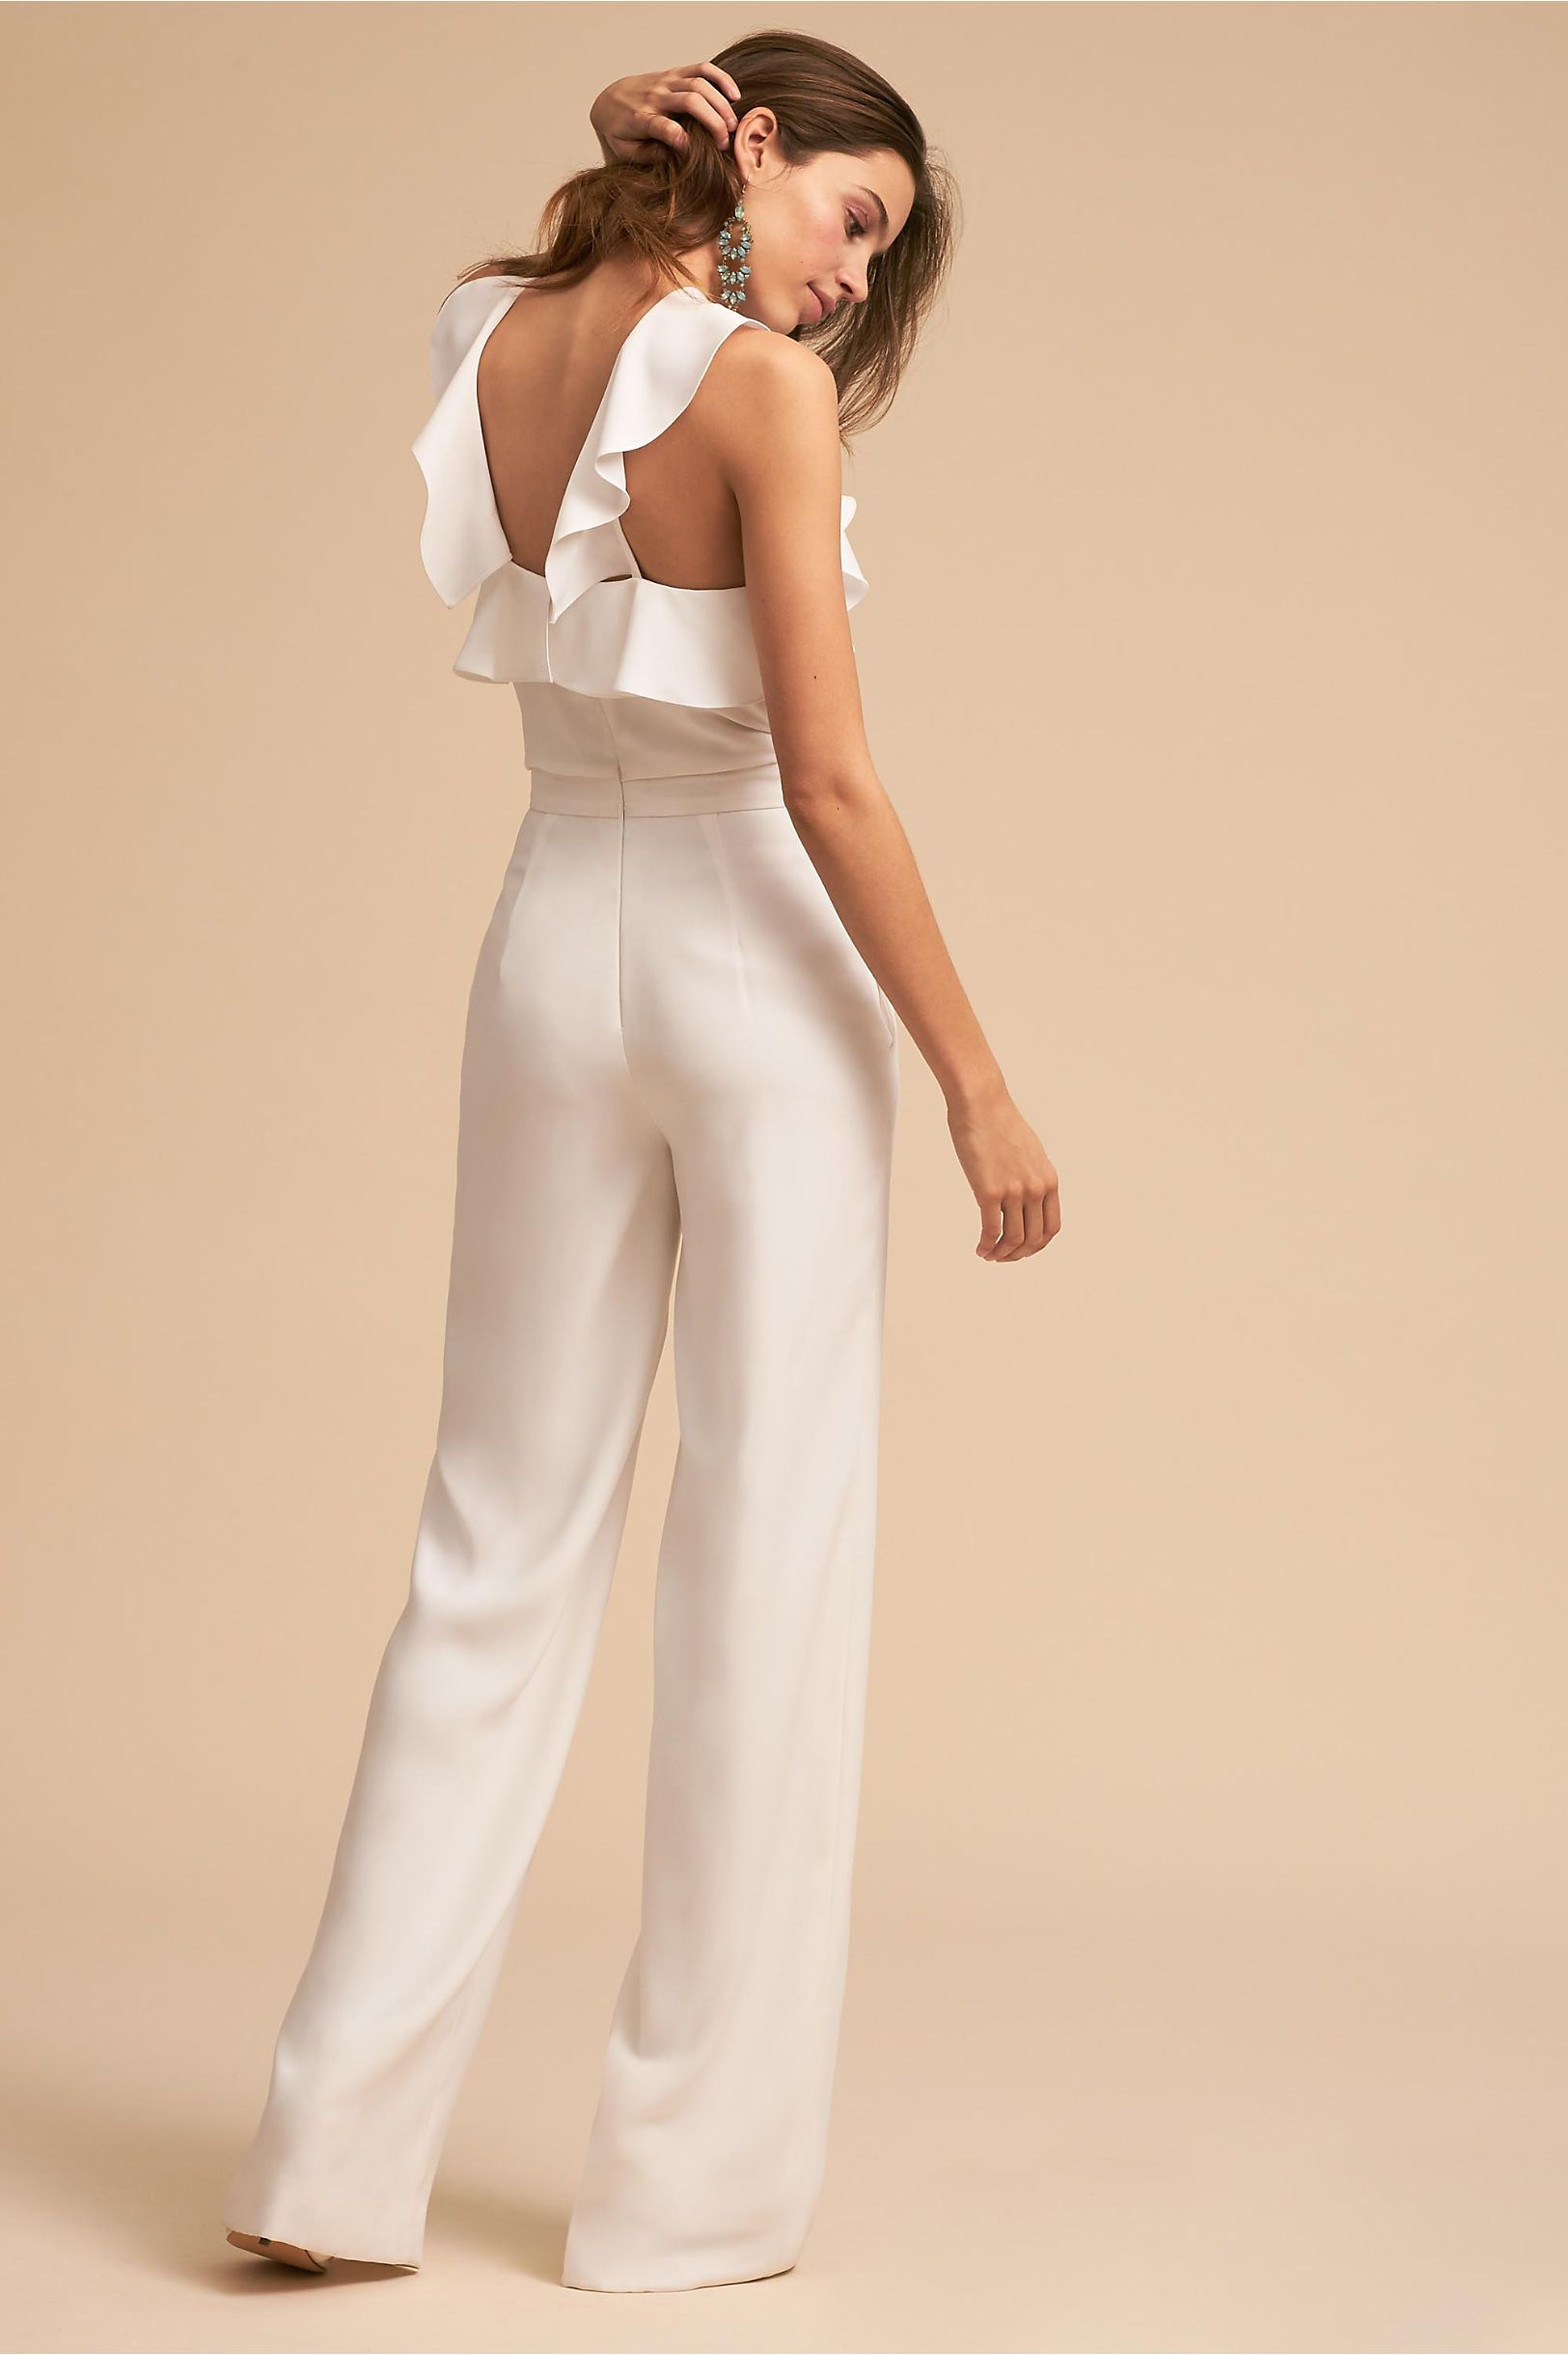 L Vely Ivory Can Be Worn After 5 Elegant Jumpsuit I Want It N W Monos Largos De Vestir Ropa Elegante Vestidos Para Grado